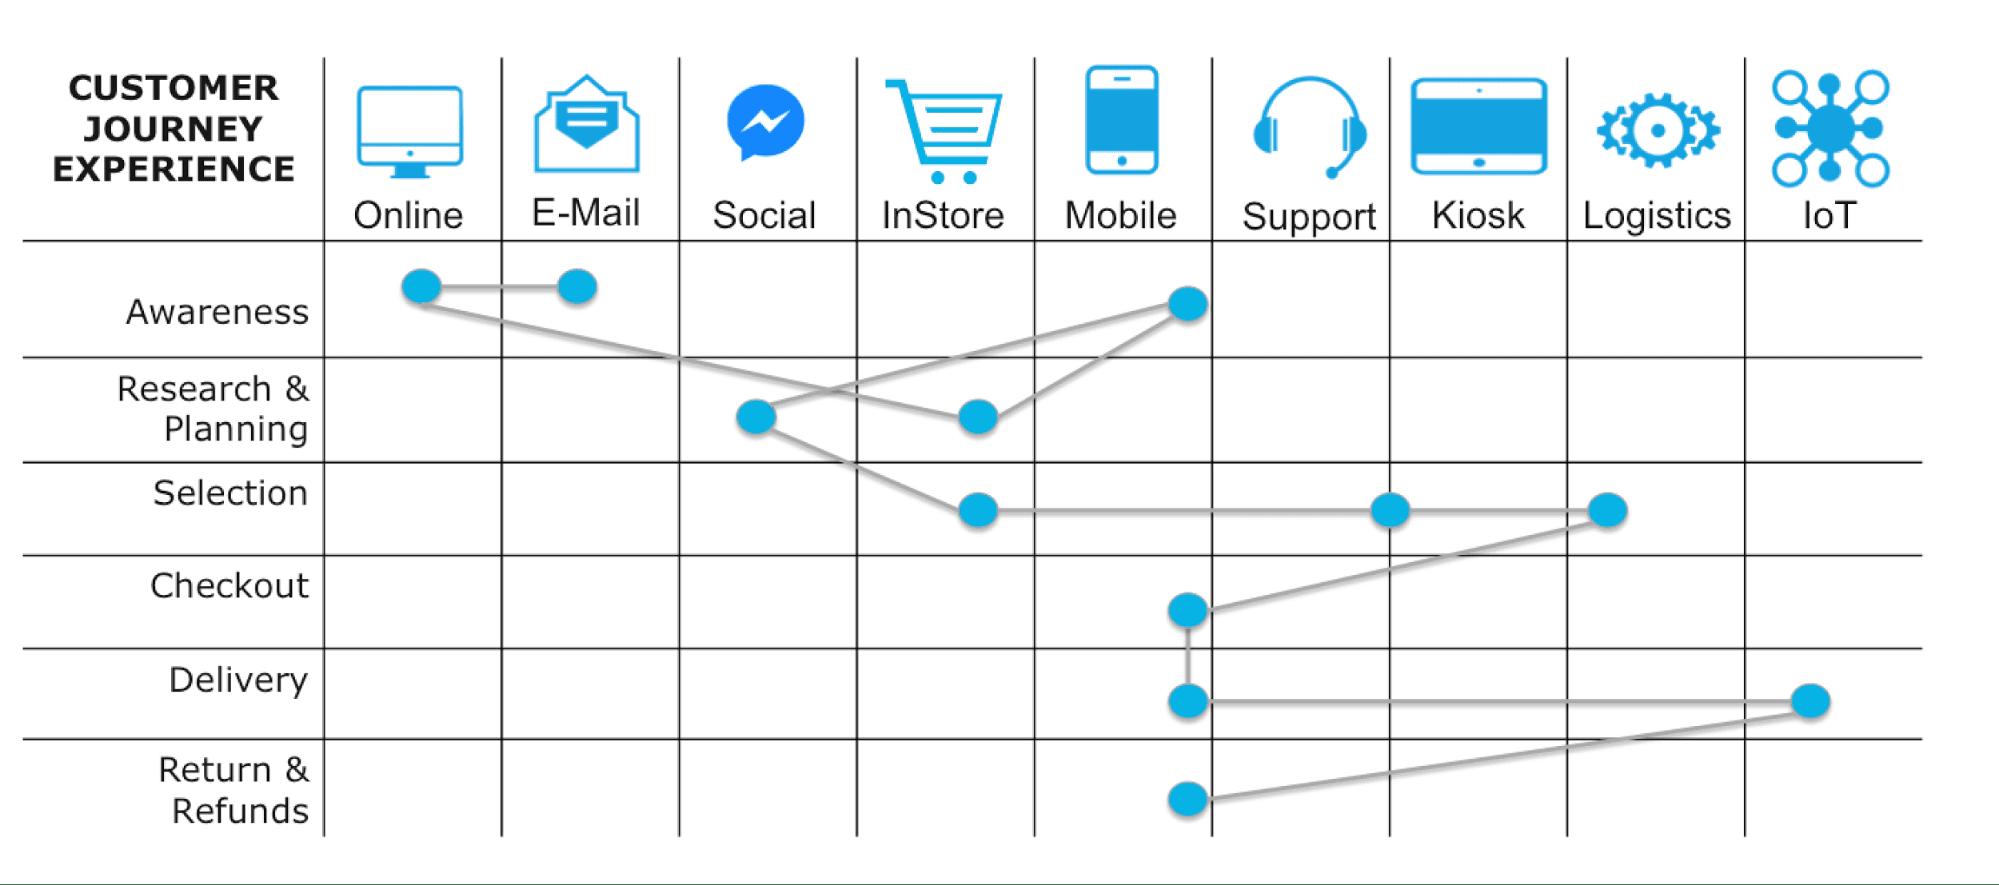 customer-journey-experience-1